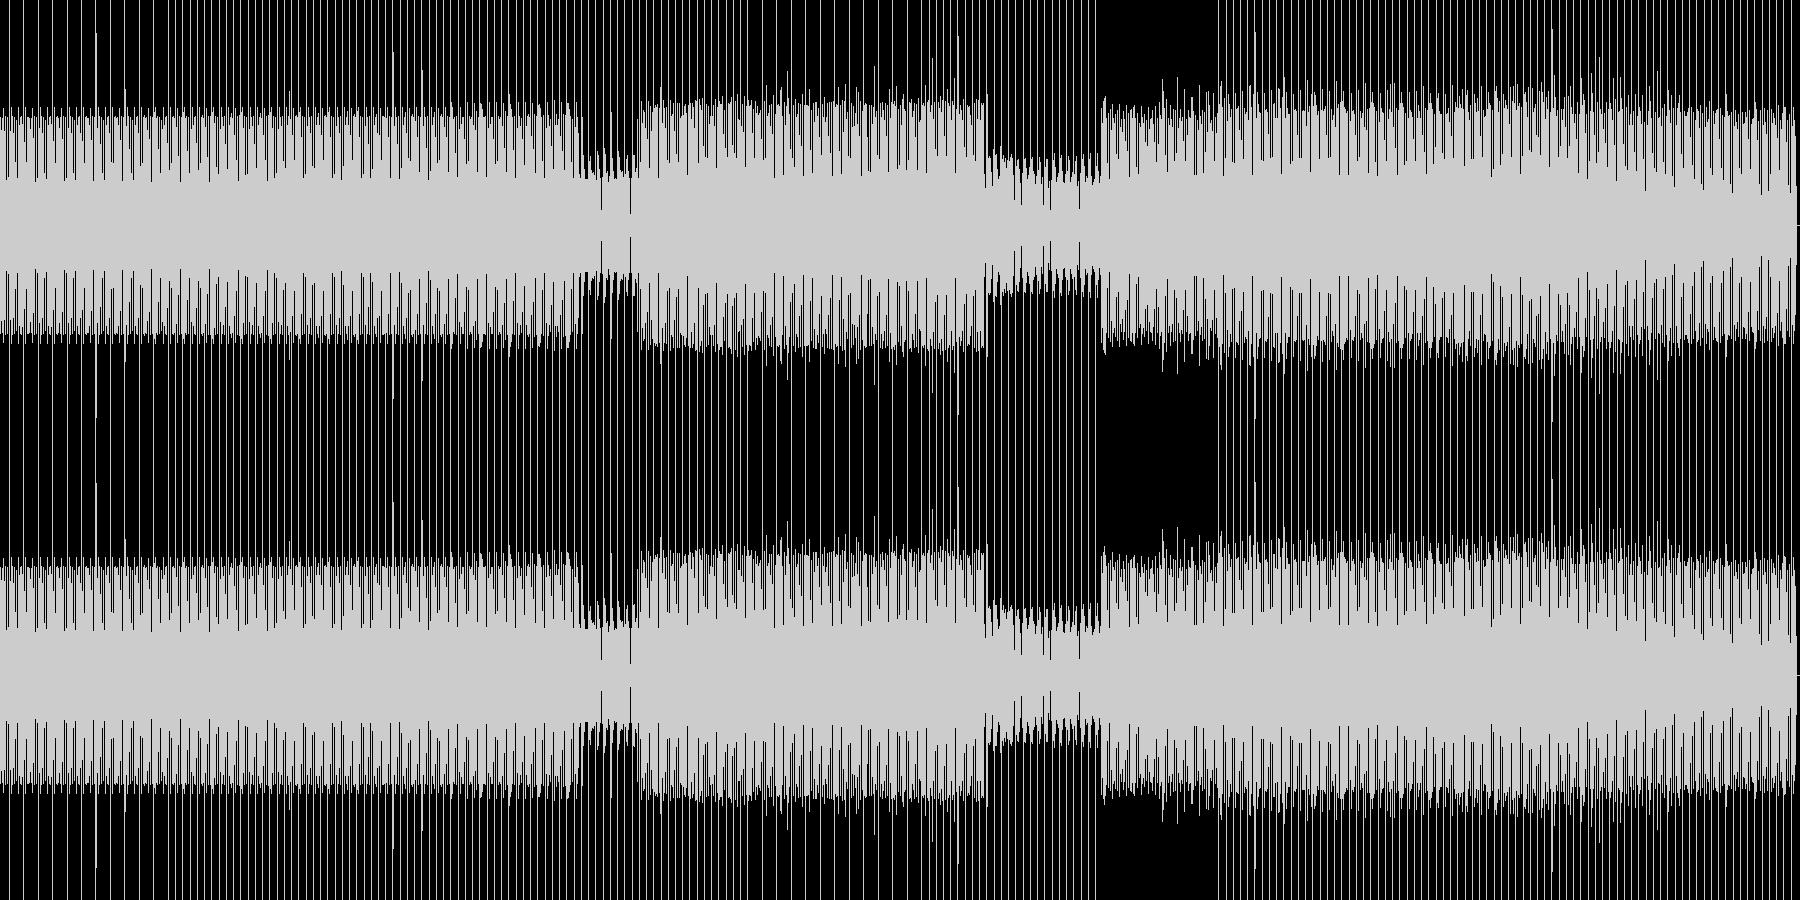 minimal house 02 の未再生の波形